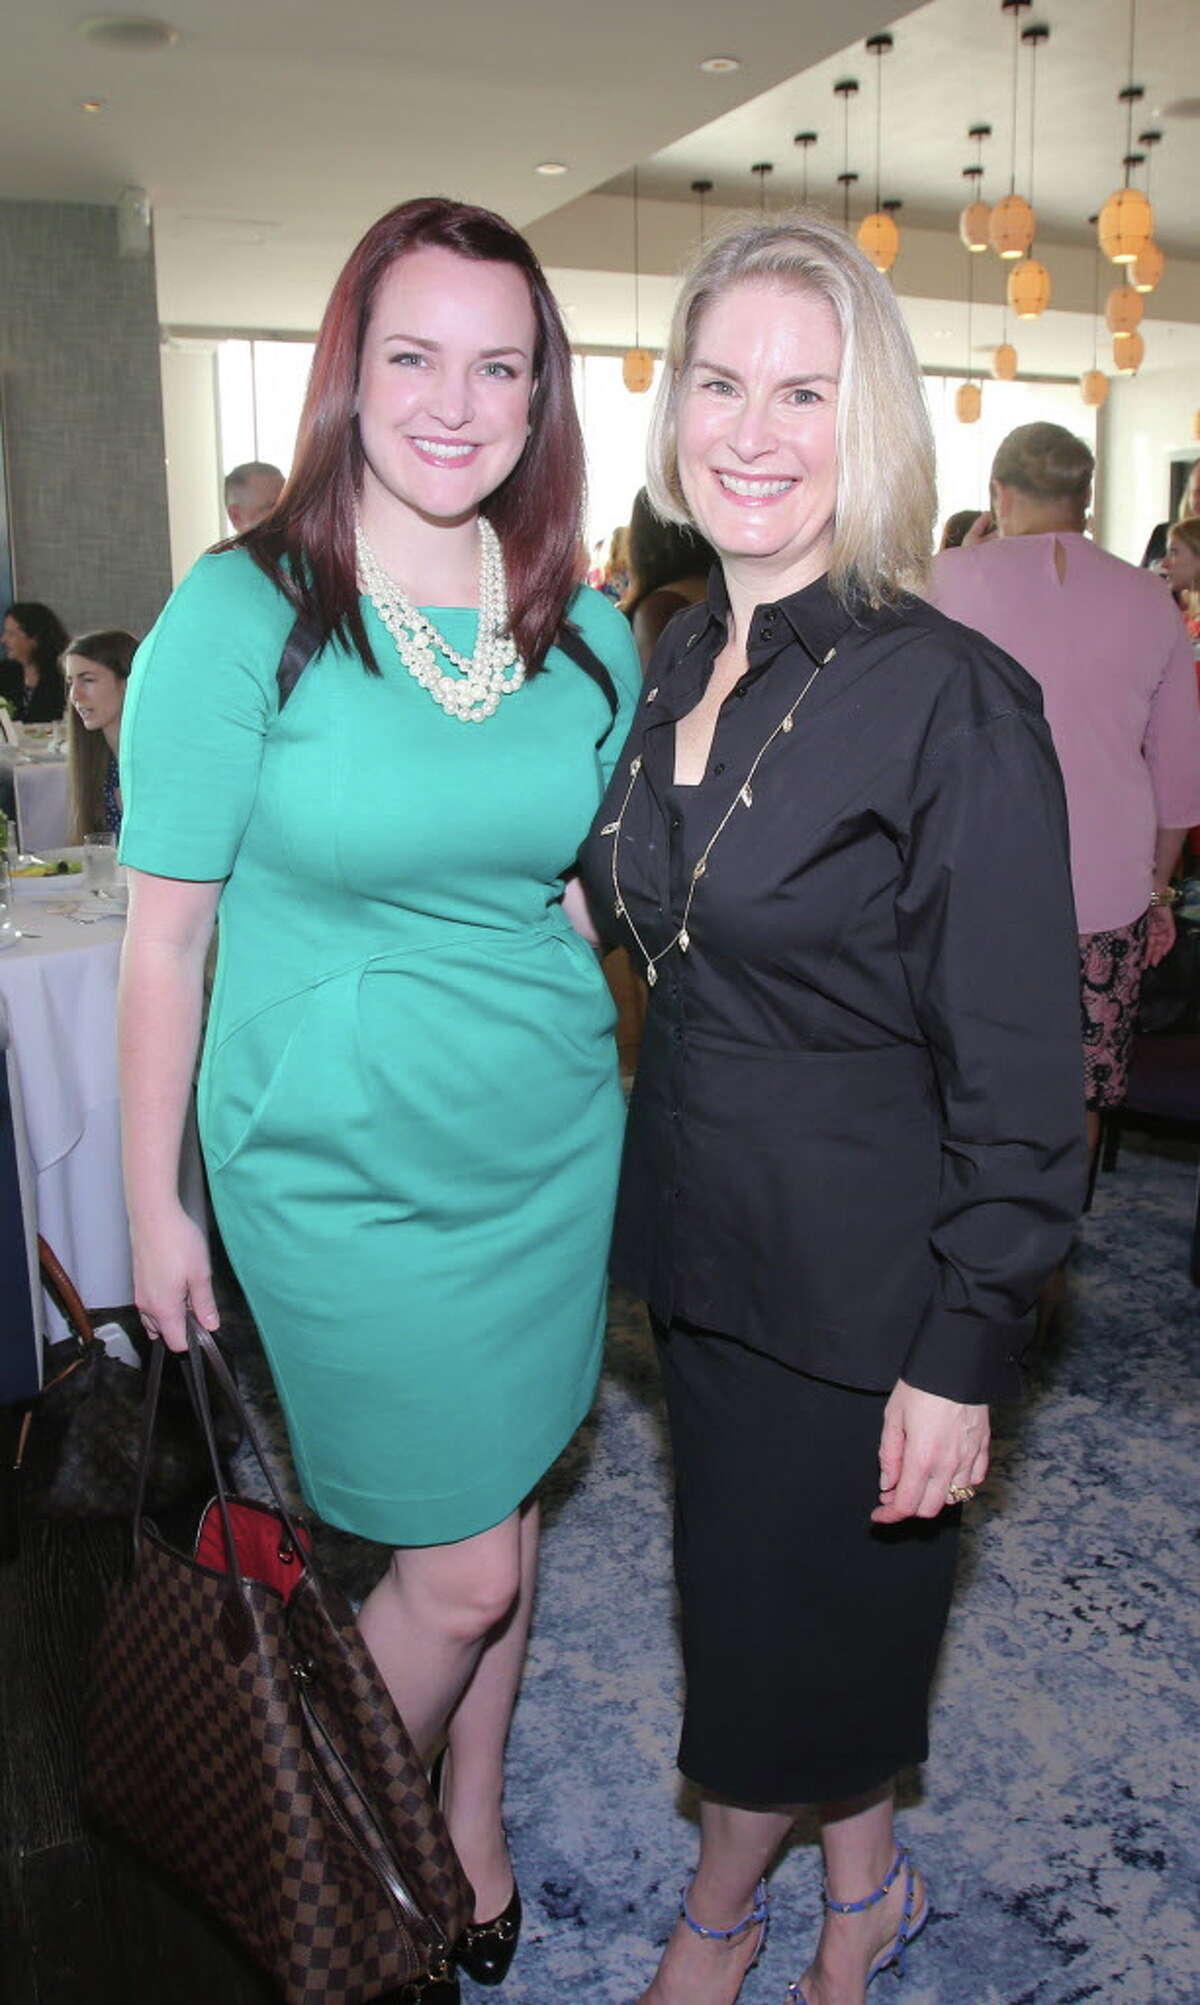 Katie Tipper-McWhorter and Amy Hertz at Ellevate Houston's executive breakfast.